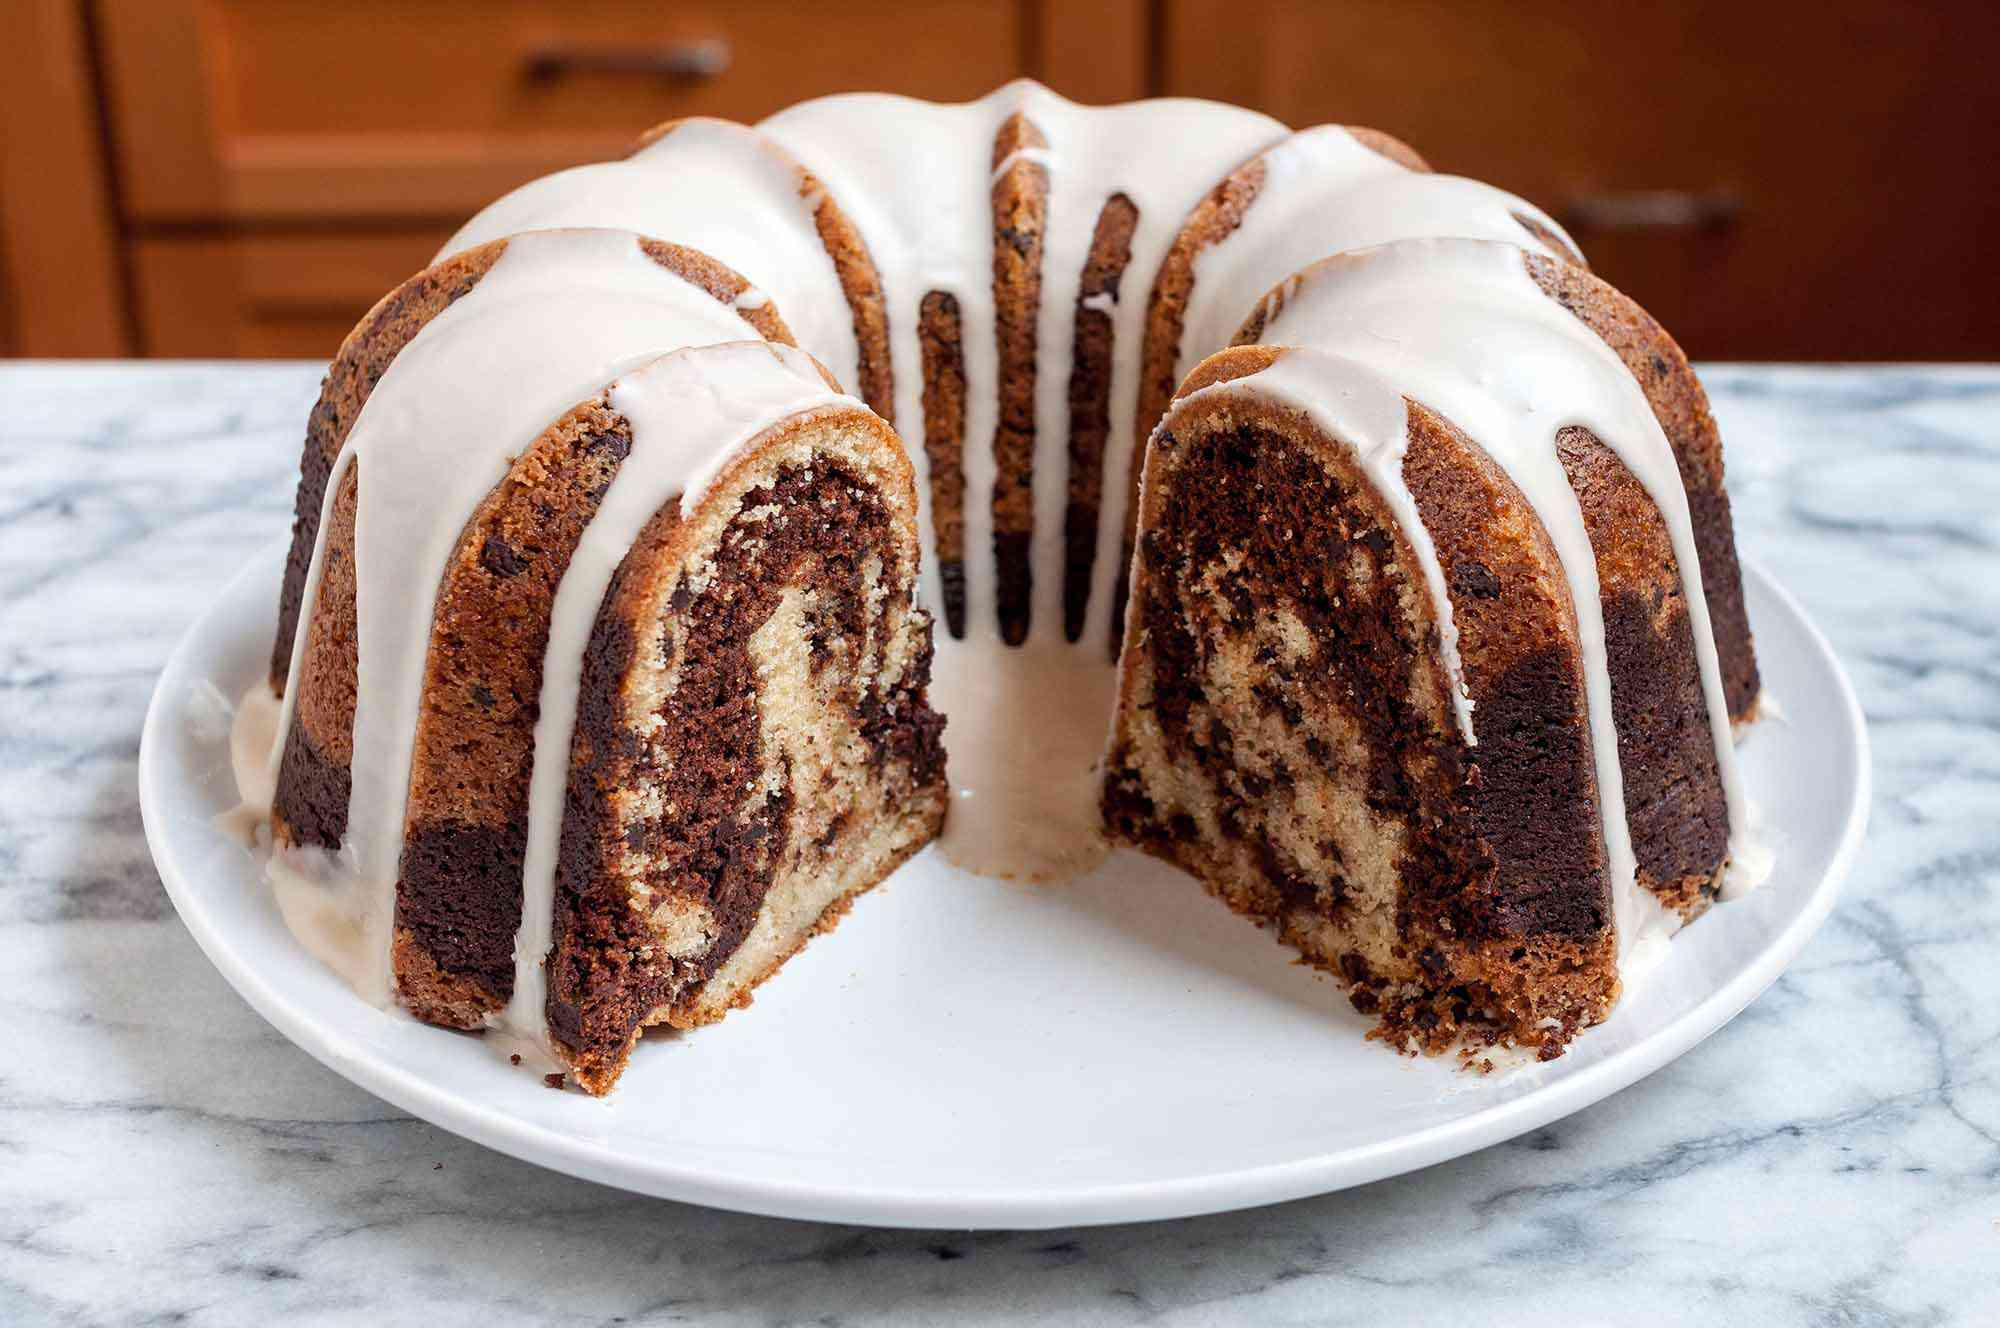 Vanilla Chocolate Marbled Bundt Cake